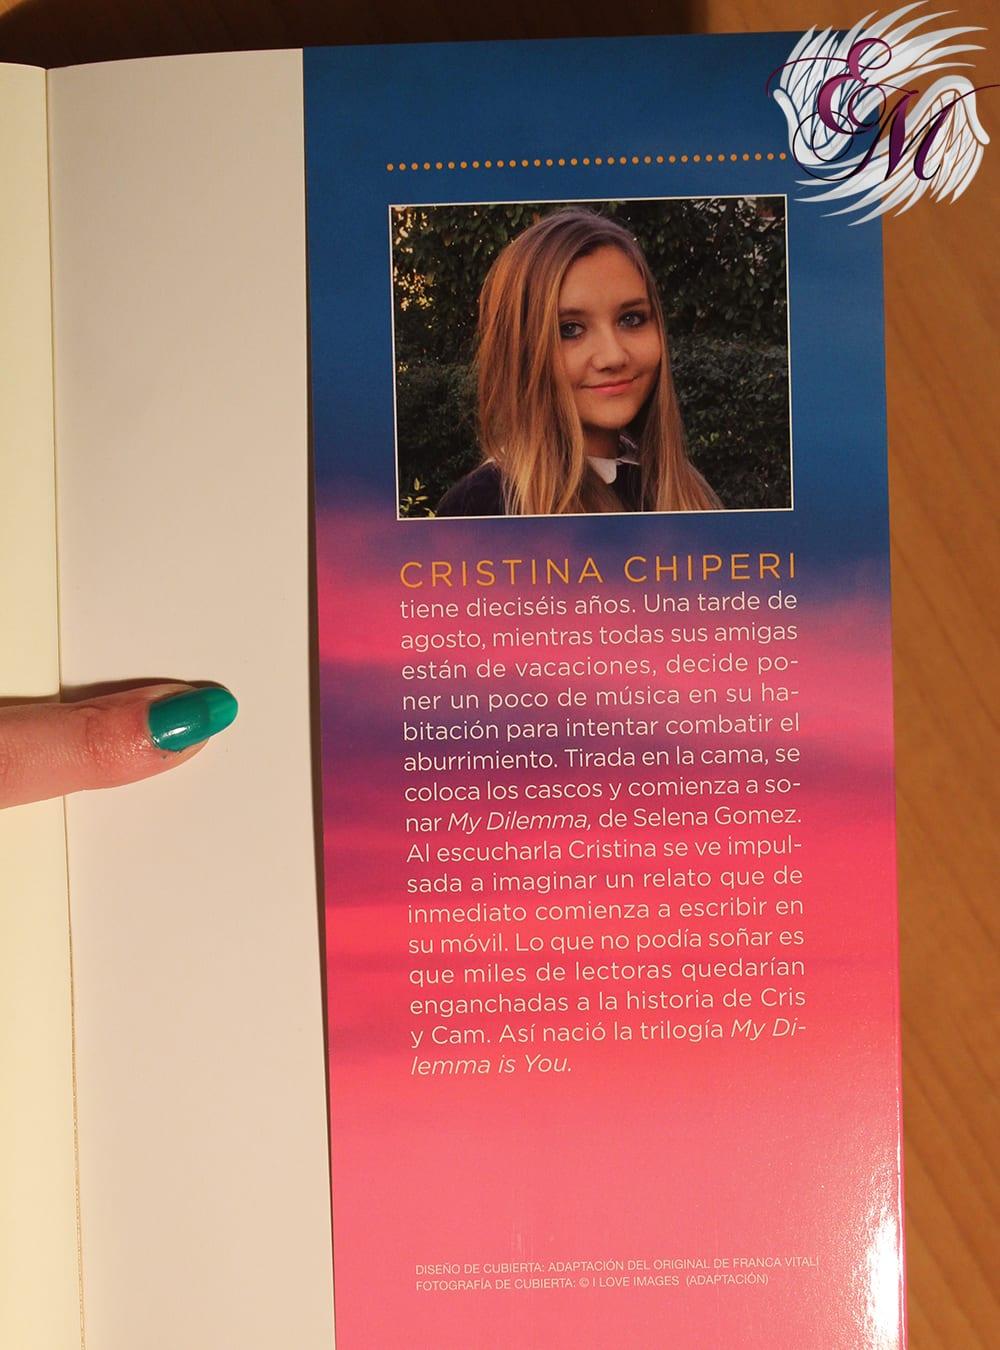 My Dilemma Is You #2: ¿Te amo o te odio?, de Cristina Chiperi – Reseña